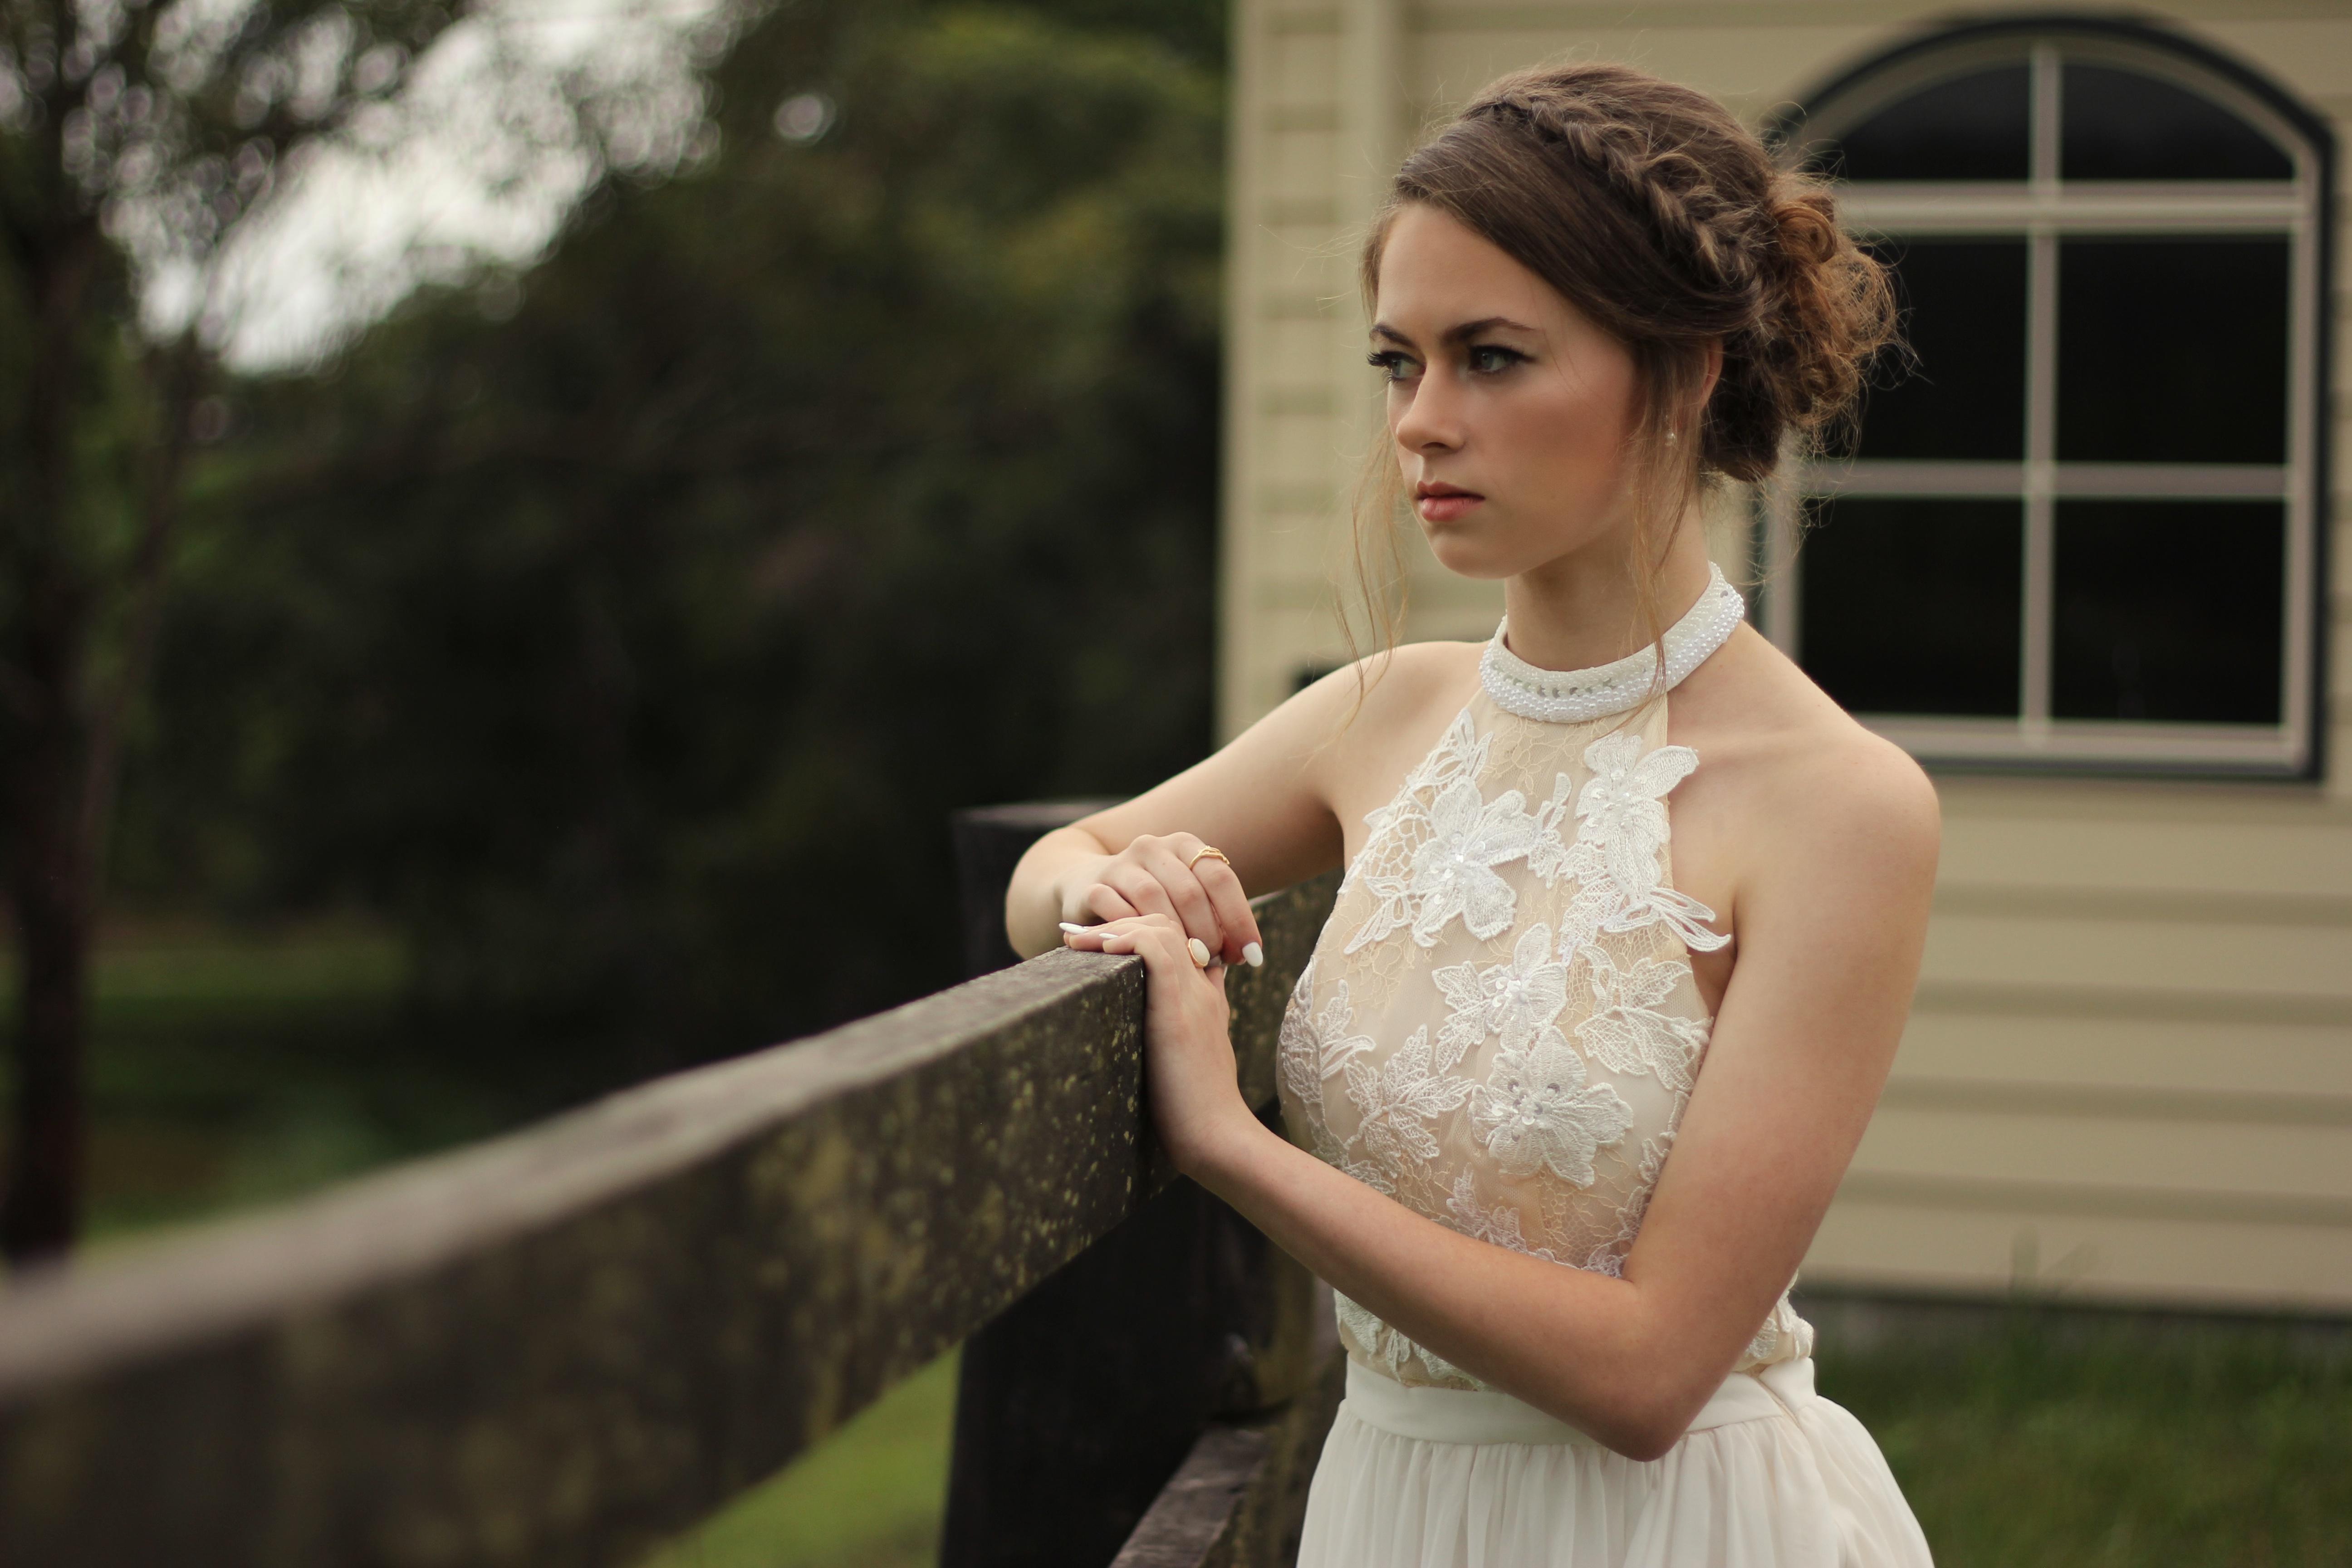 woman-hair-clothing-wedding-wedding-dress-bride-23472-pxhere.com